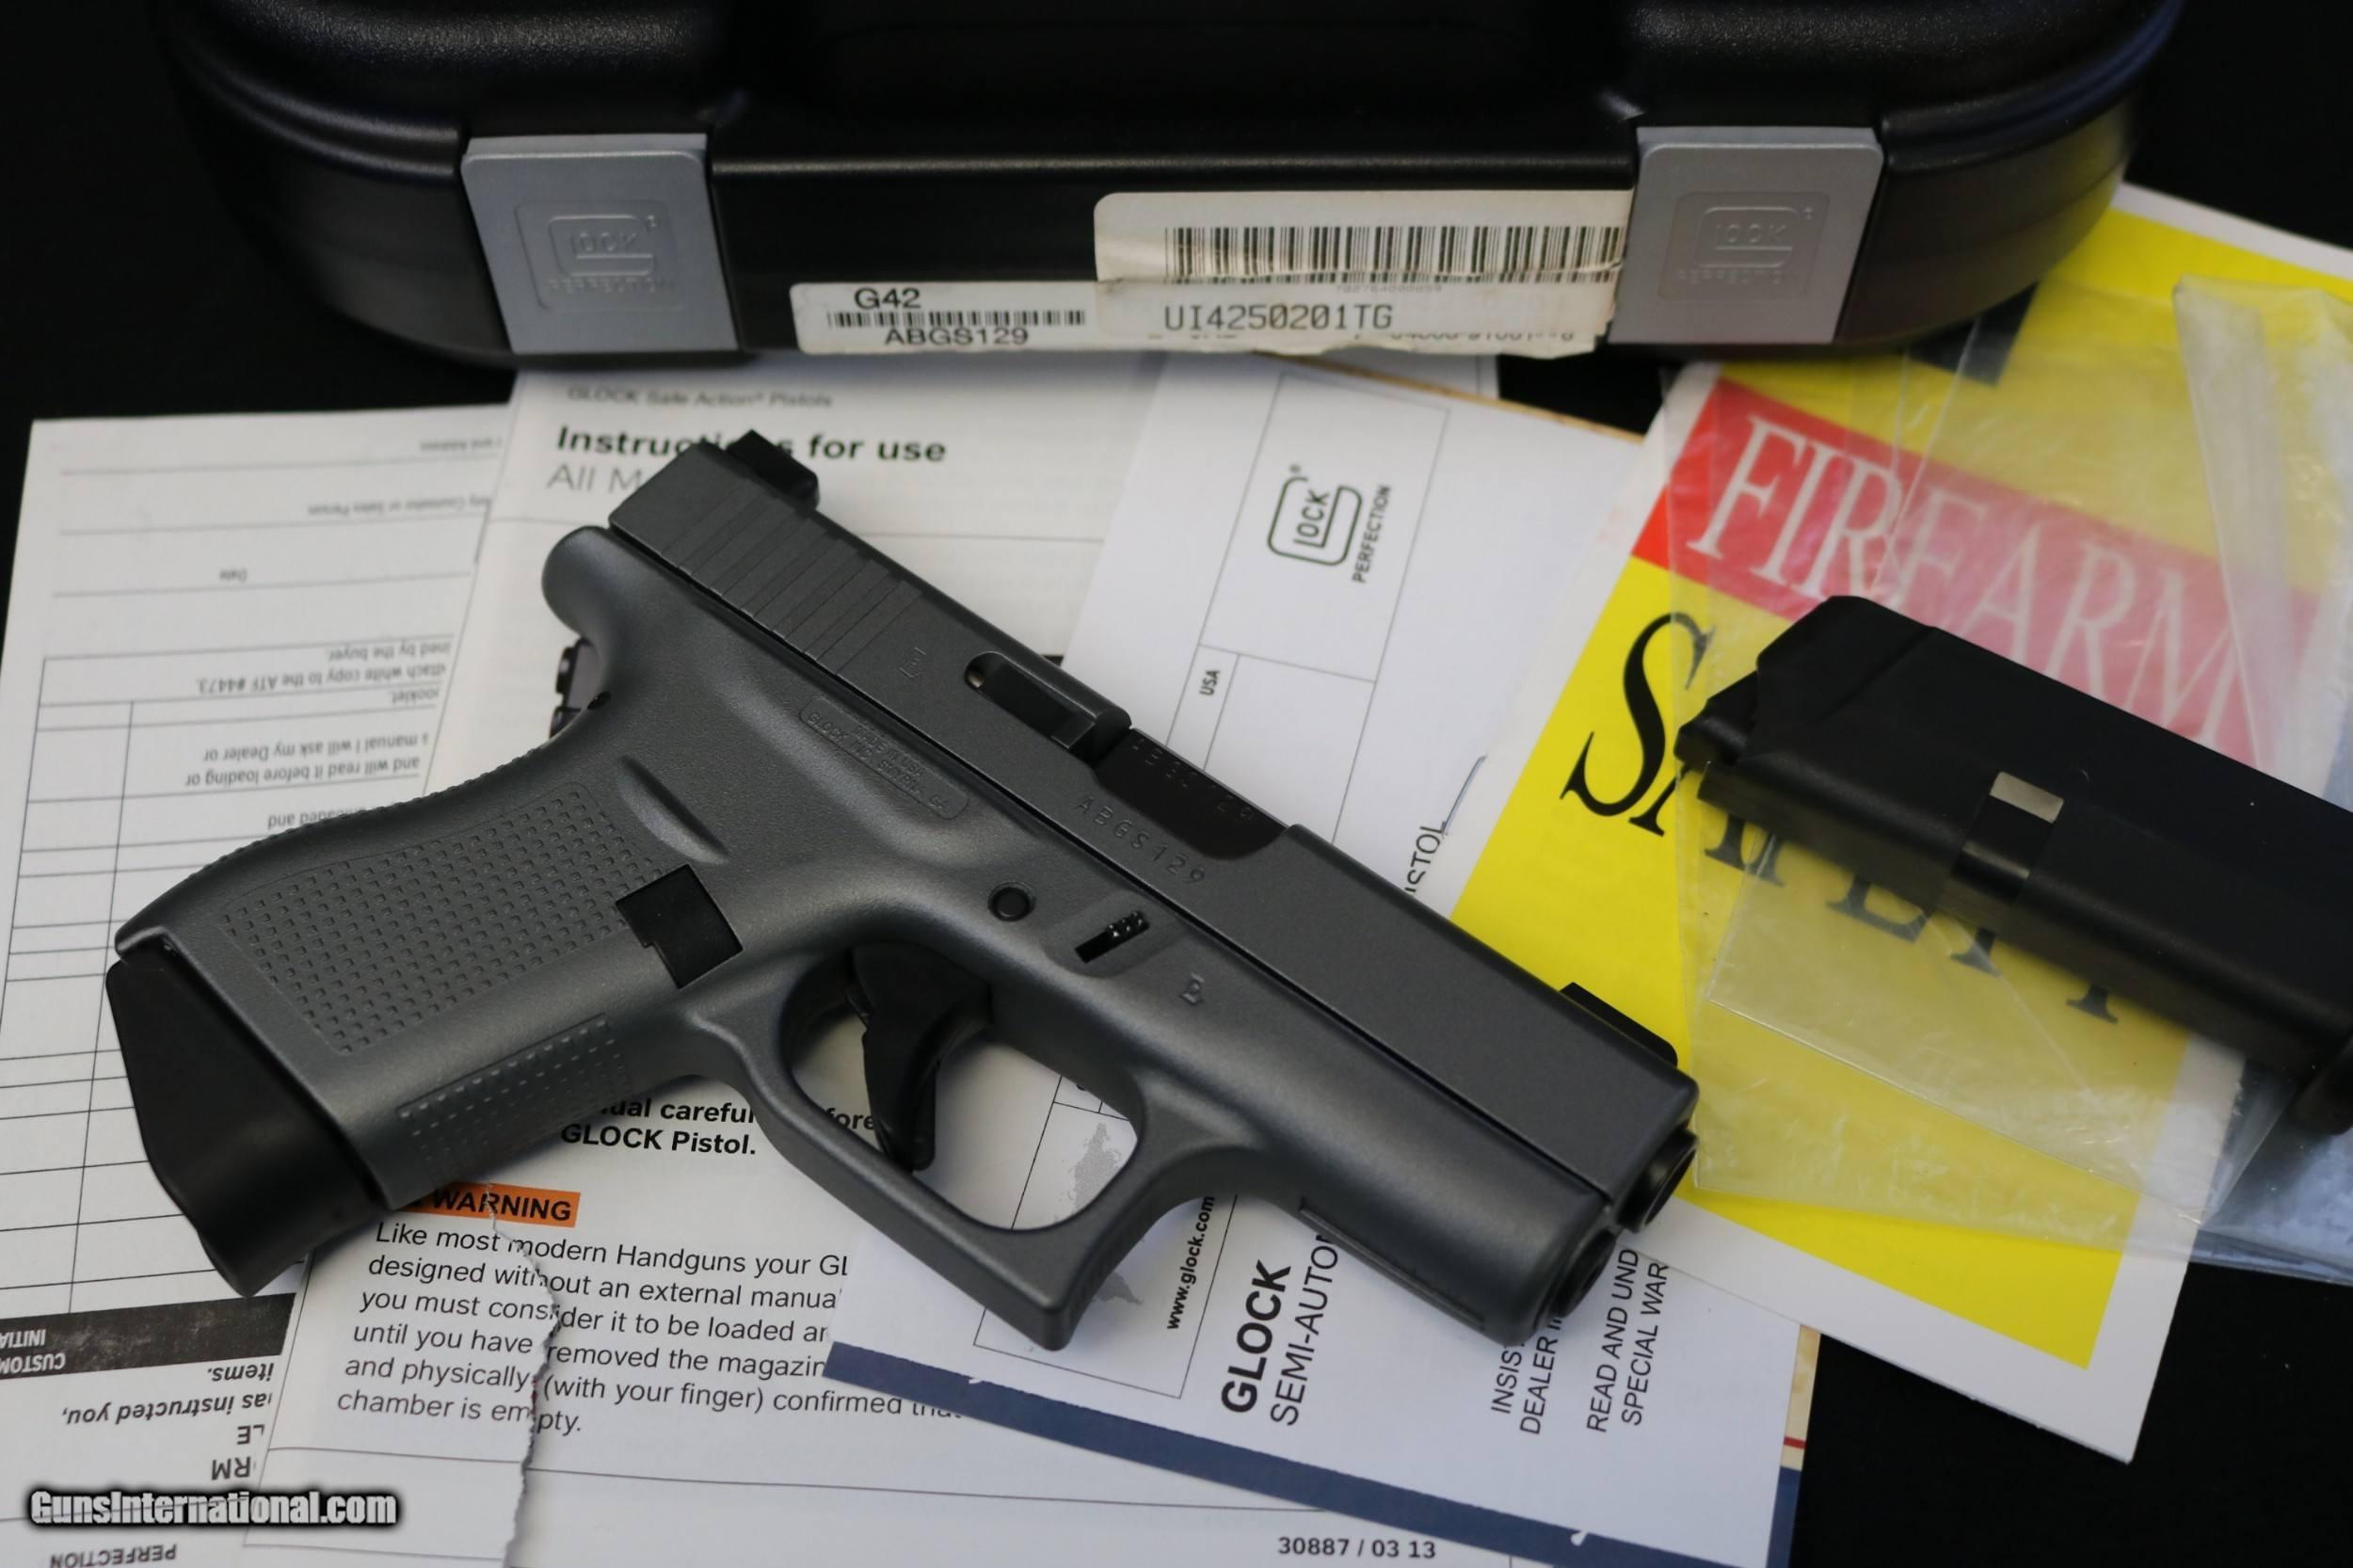 Like New Glock 42 380 Factory Gray w/ box & papers 3 dot